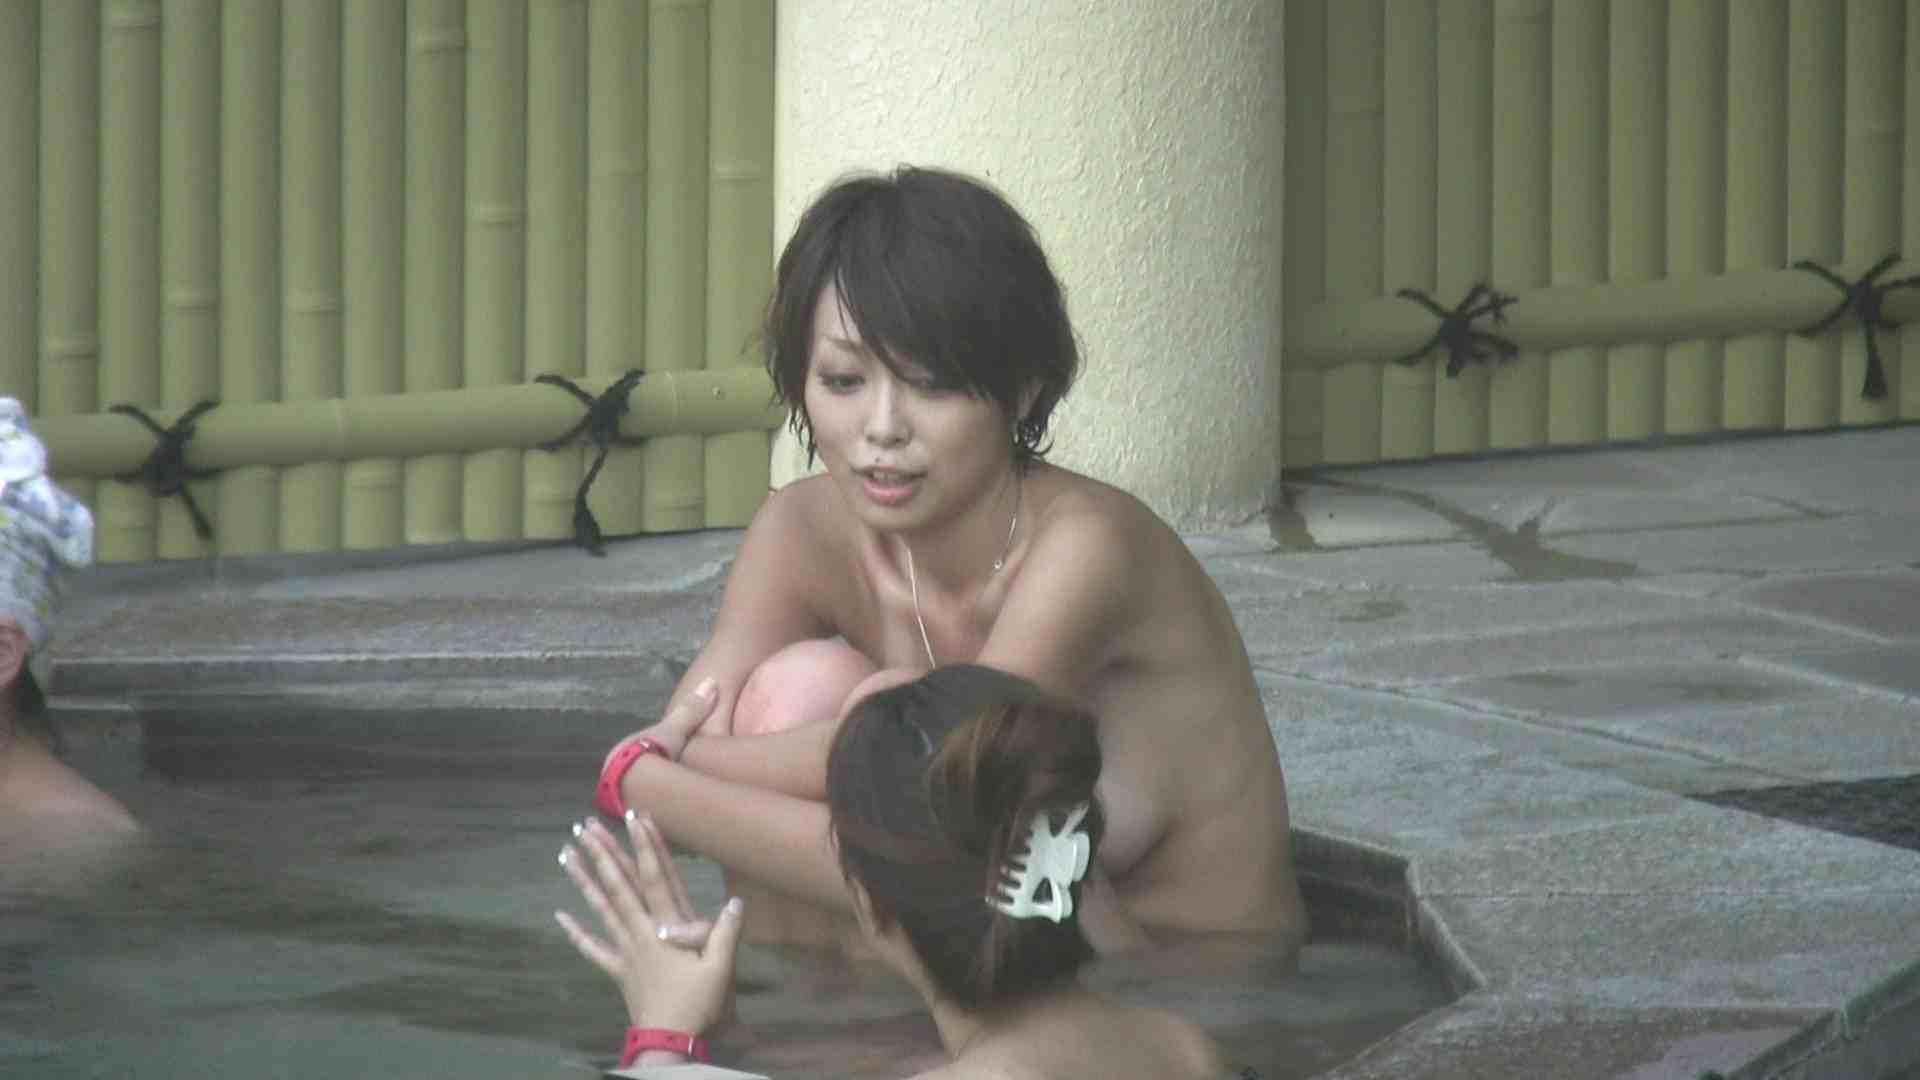 Aquaな露天風呂Vol.201 露天風呂編  102PIX 52